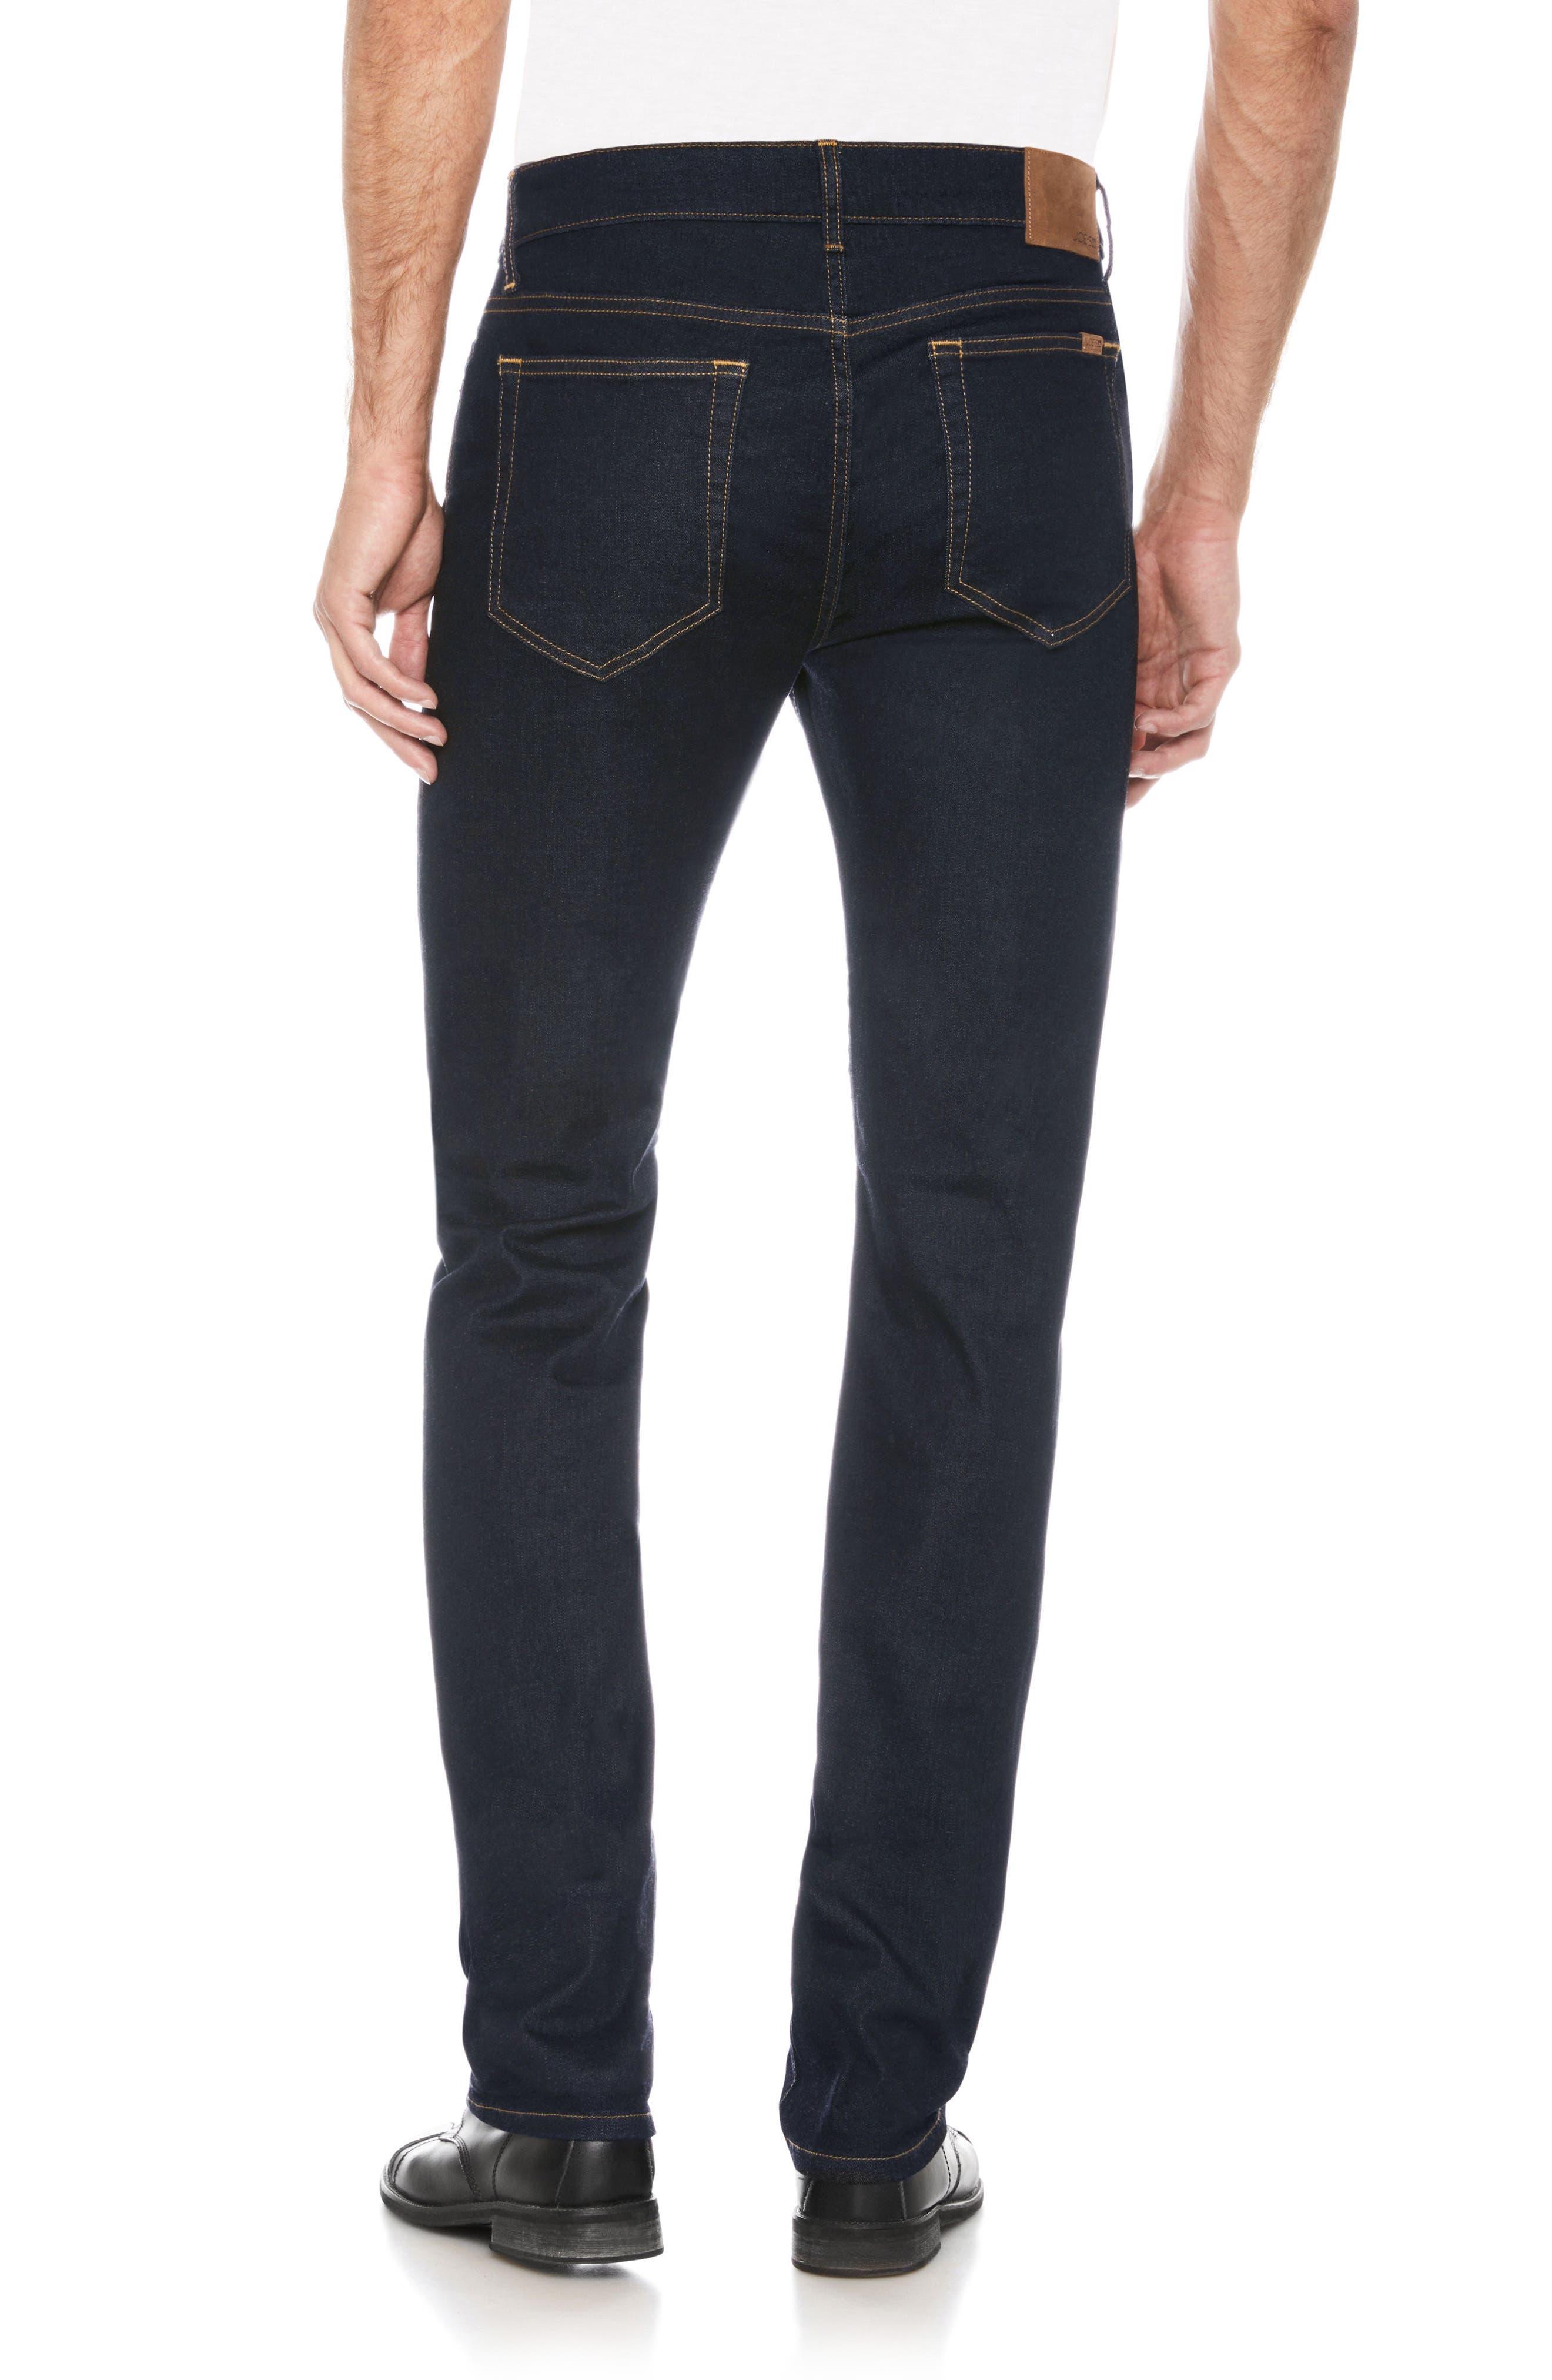 Brixton Slim Straight Fit Jeans,                             Alternate thumbnail 2, color,                             Jazz